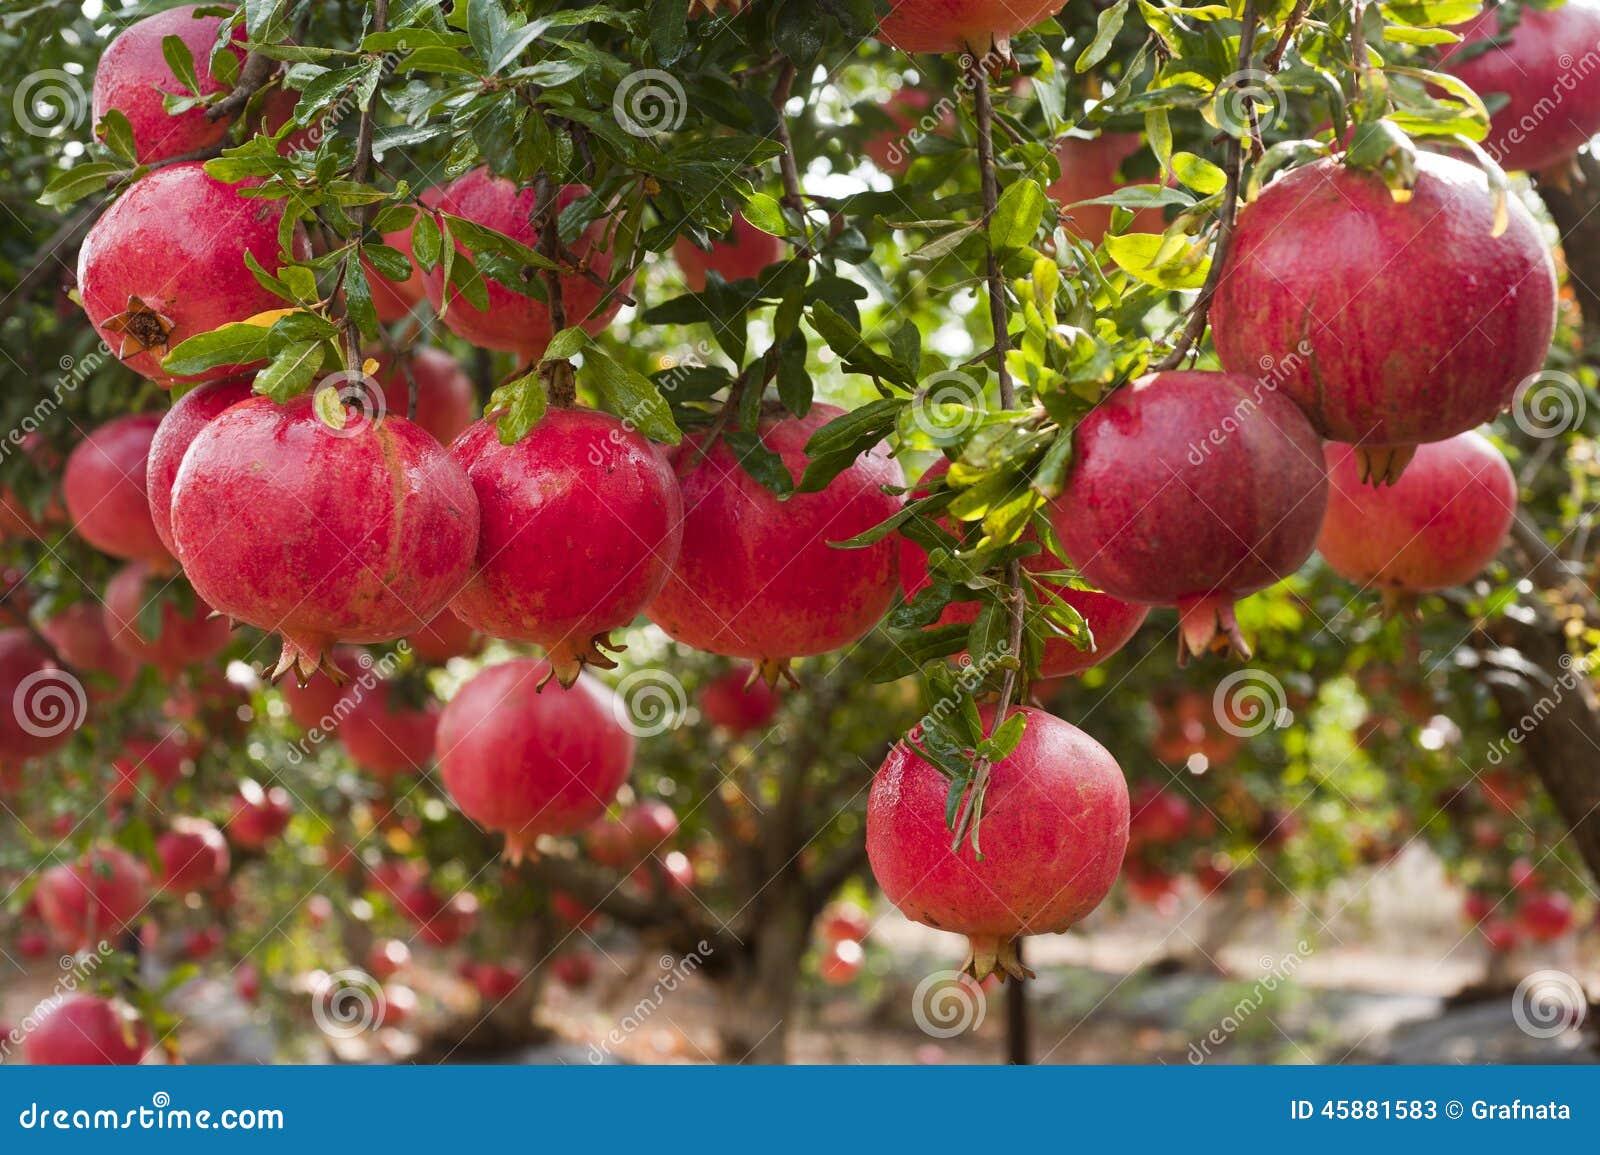 Ripe pomegranate fruit on tree branch stock photo image for Arbol granada de jardin